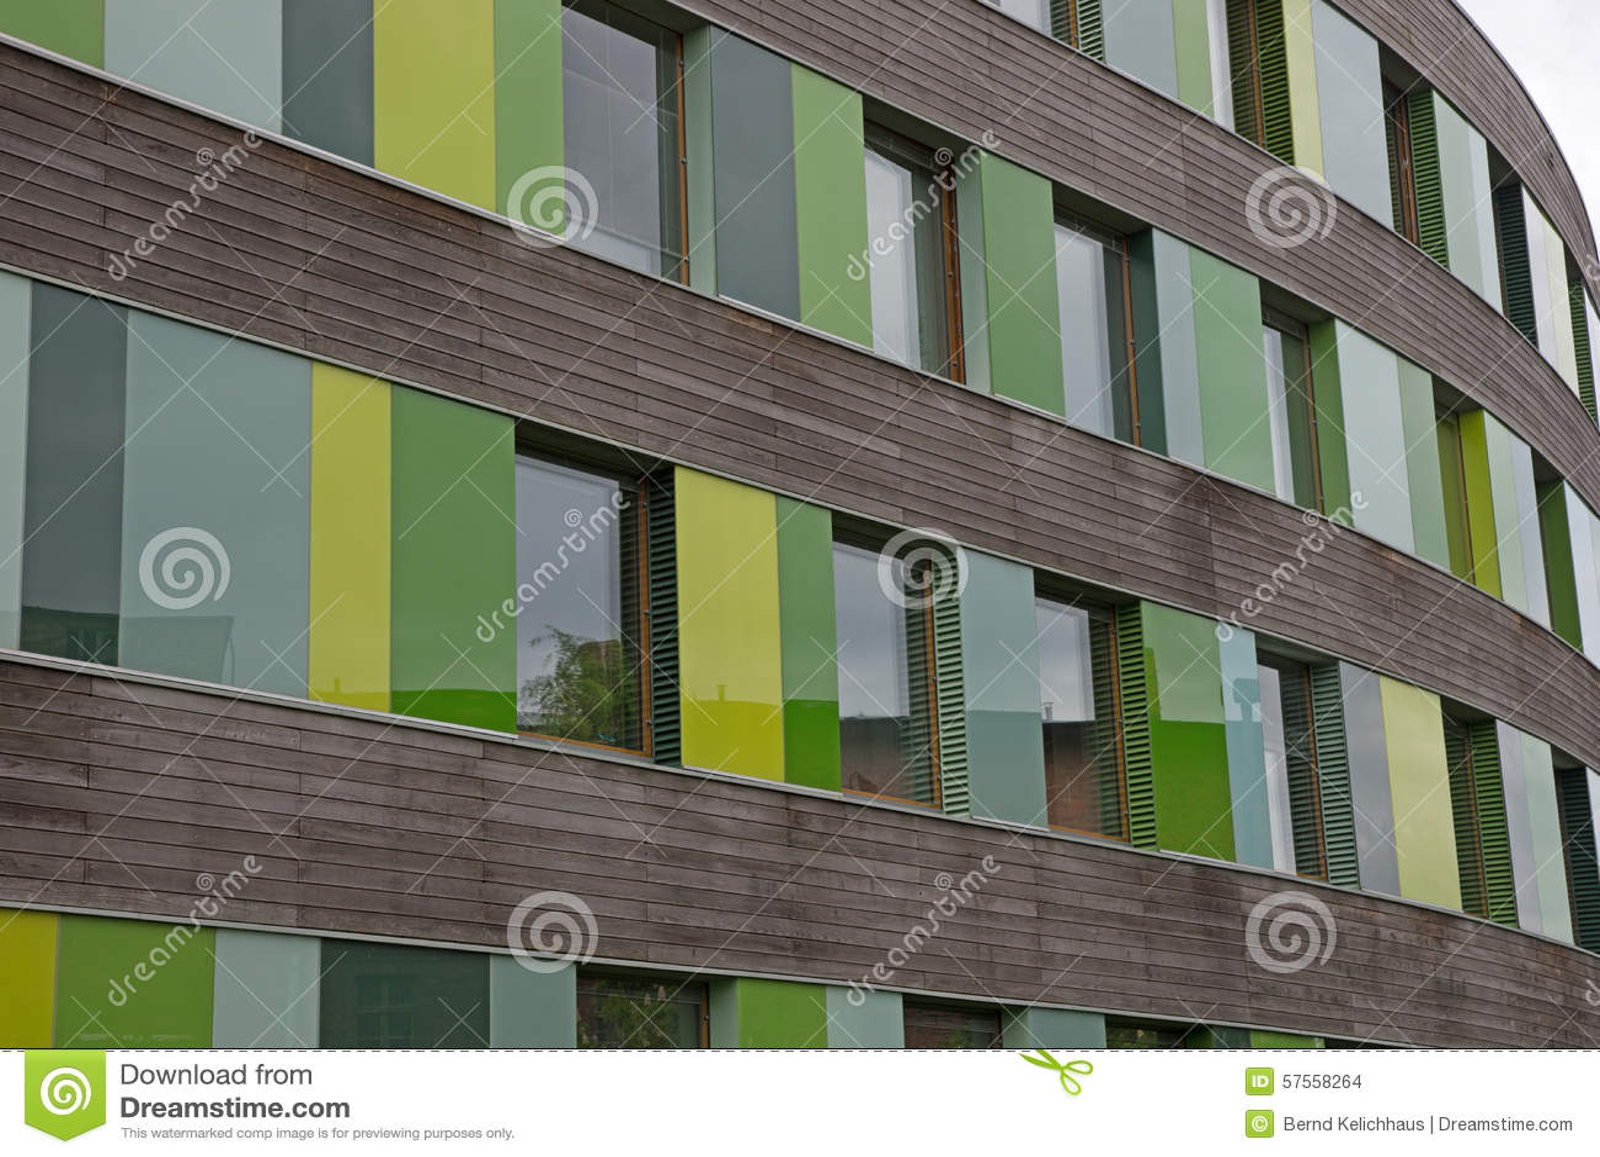 Glasfassade bunt  Farbige Glasfassade Stockfoto - Bild: 57558264